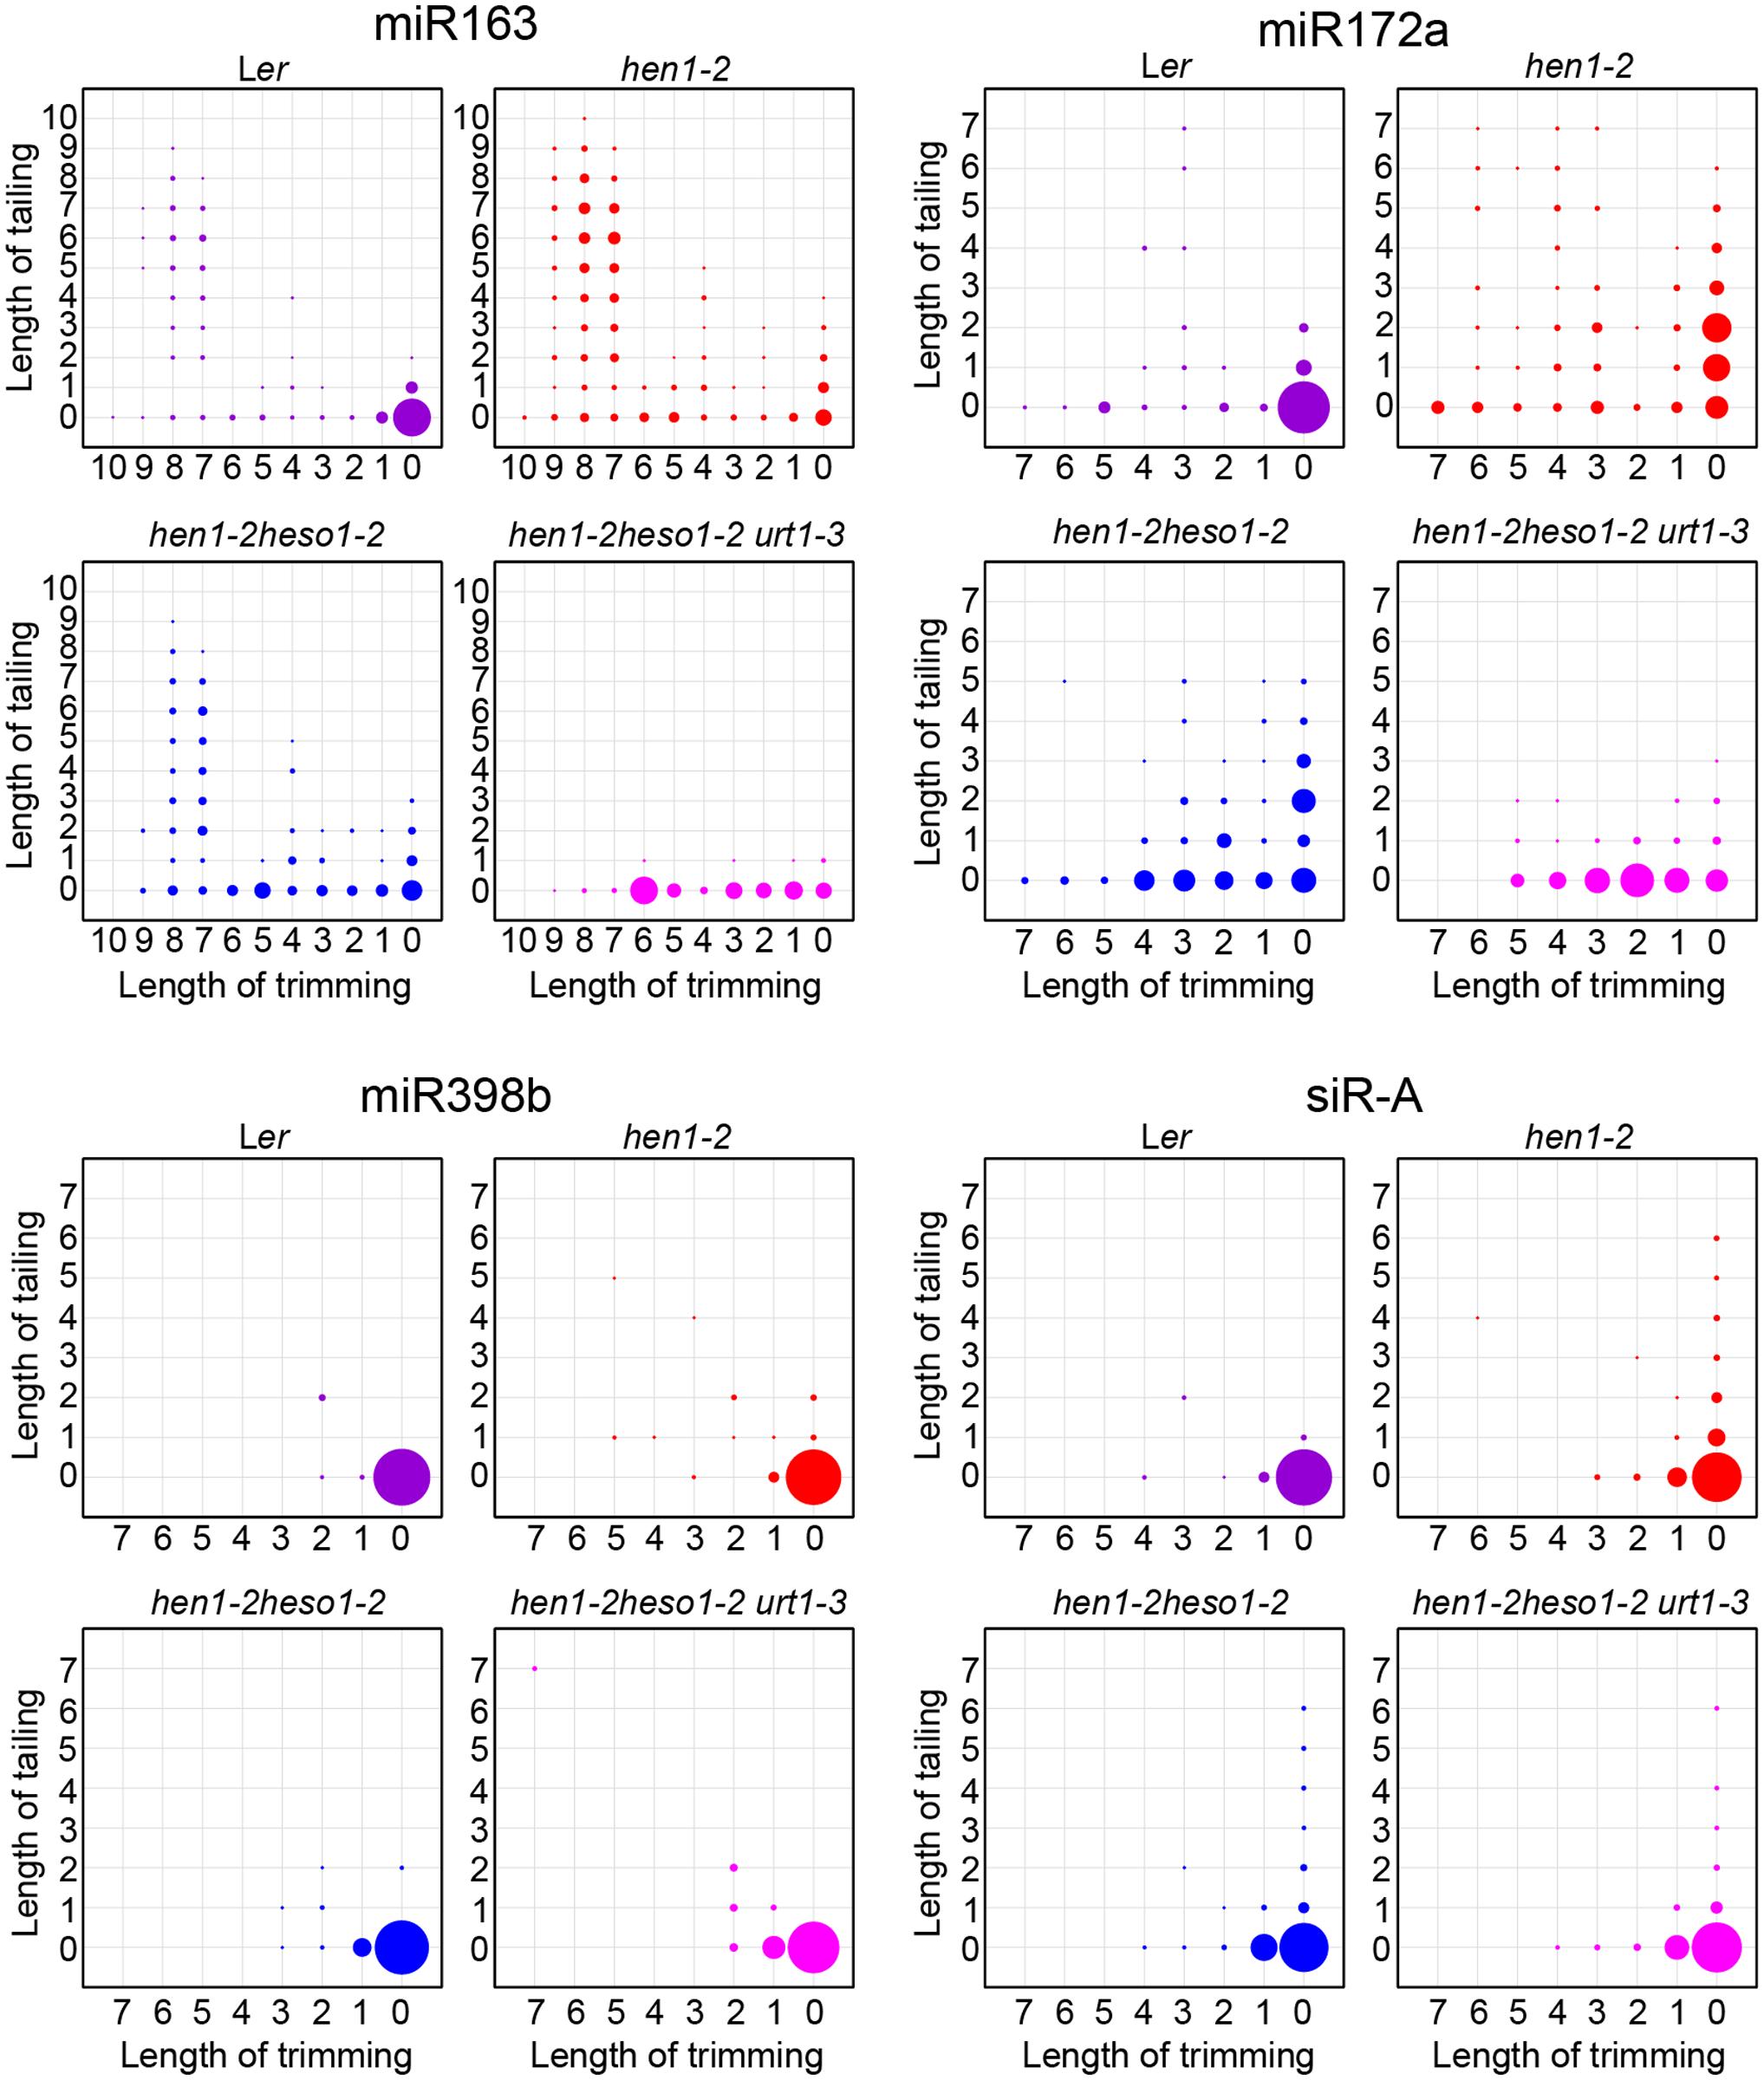 <i>urt1-3</i> affects miRNAs but not siRNAs uridylation in <i>hen1-2 heso1-2</i>.